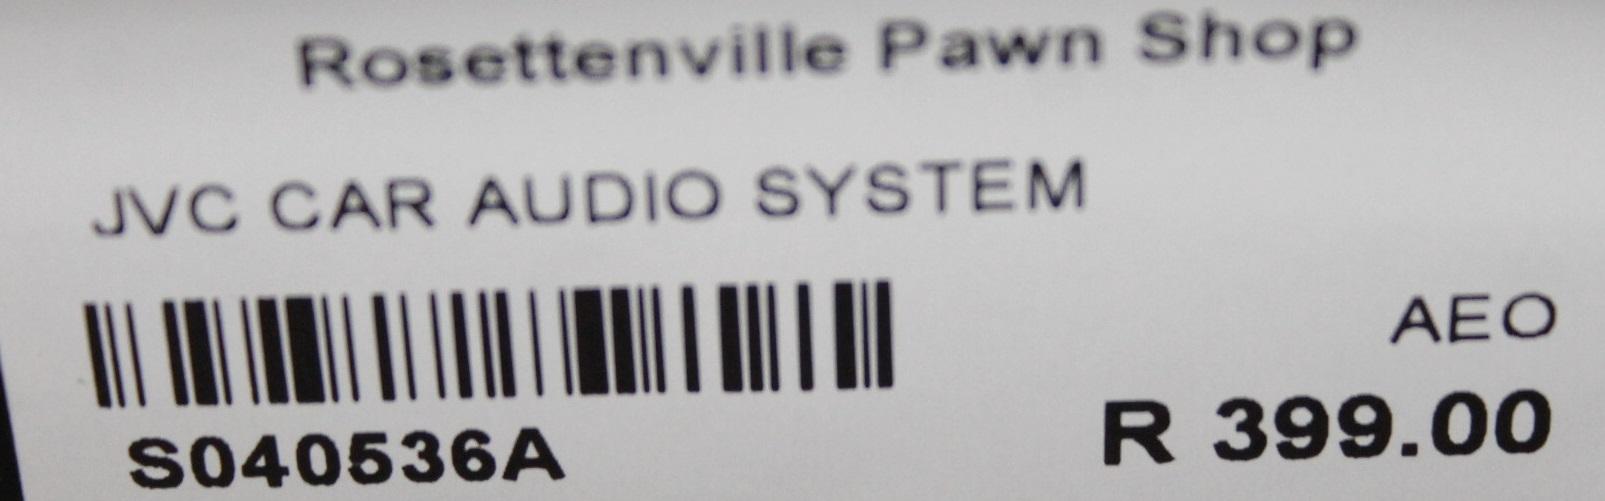 Jvc car audio system S040536A #Rosettenvillepawnshop